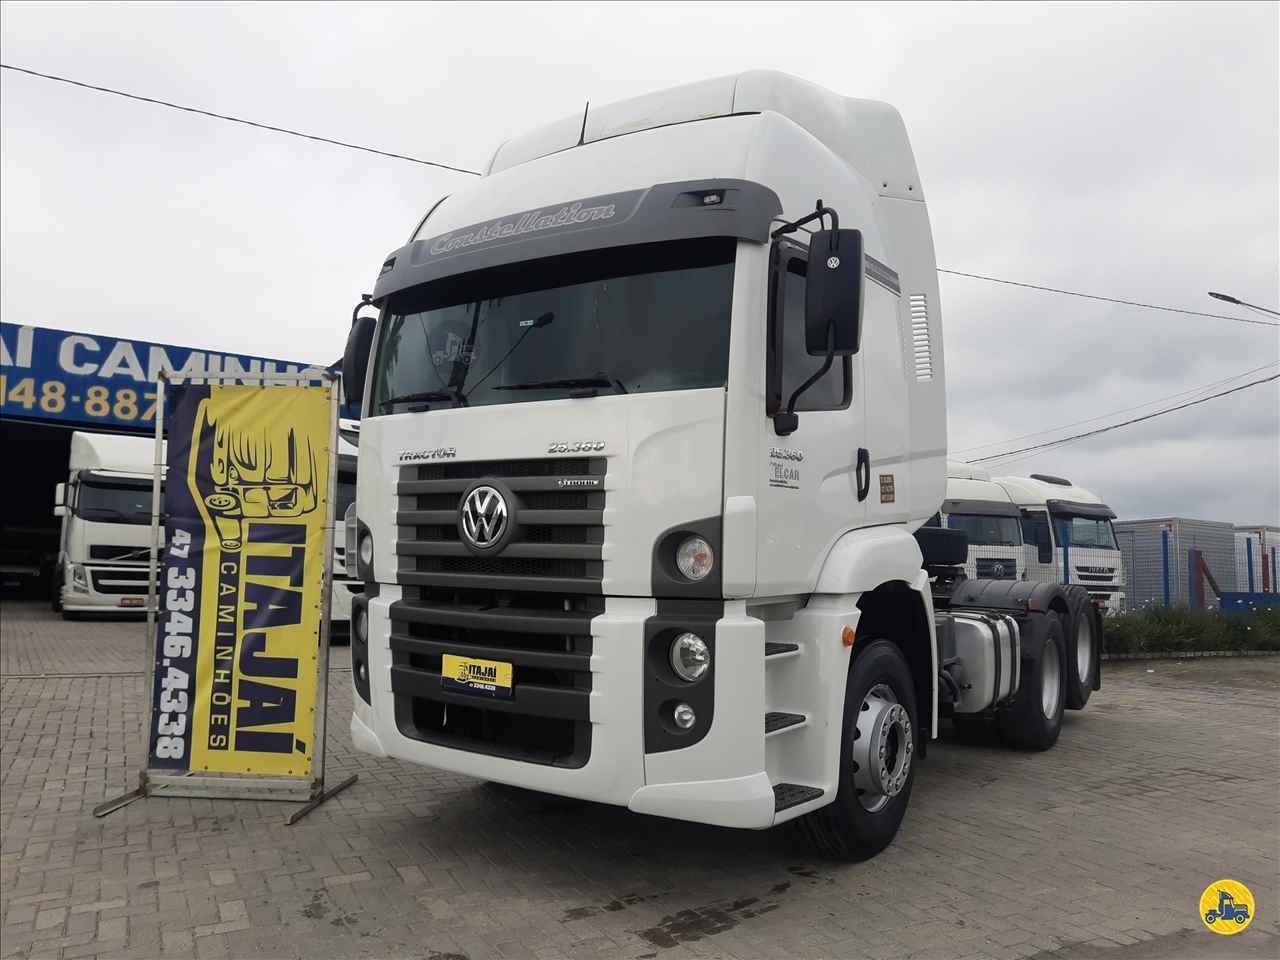 CAMINHAO VOLKSWAGEN VW 25360 Cavalo Mecânico Truck 6x2 Itajai Caminhões NAVEGANTES SANTA CATARINA SC